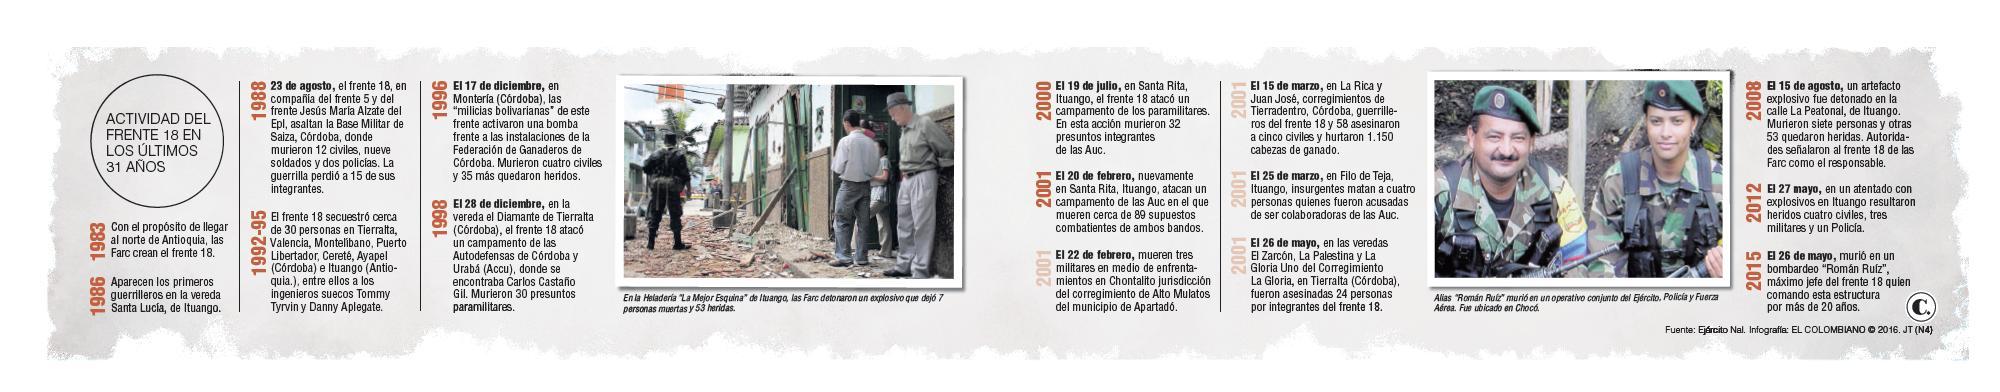 16-02-22-infografia-18th-Front